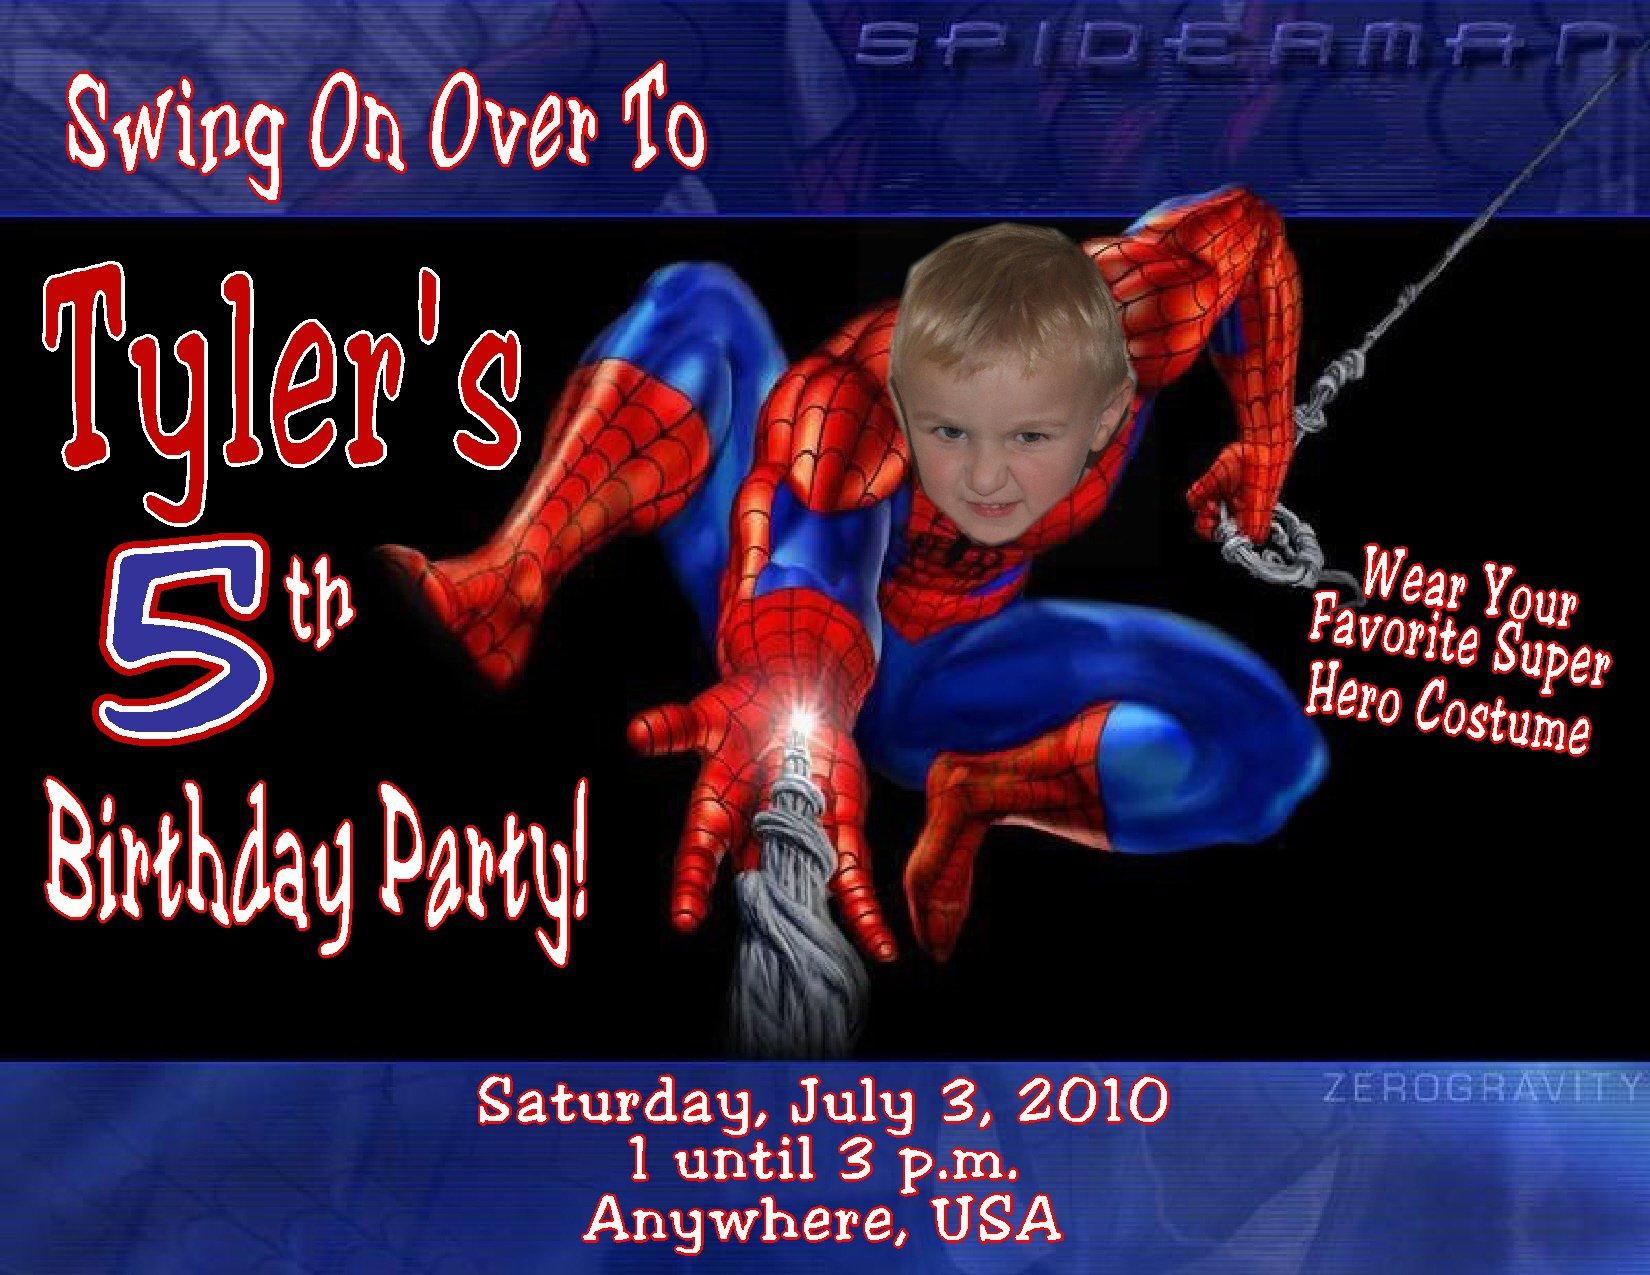 Spider-man Birthday Party Invitation Templates